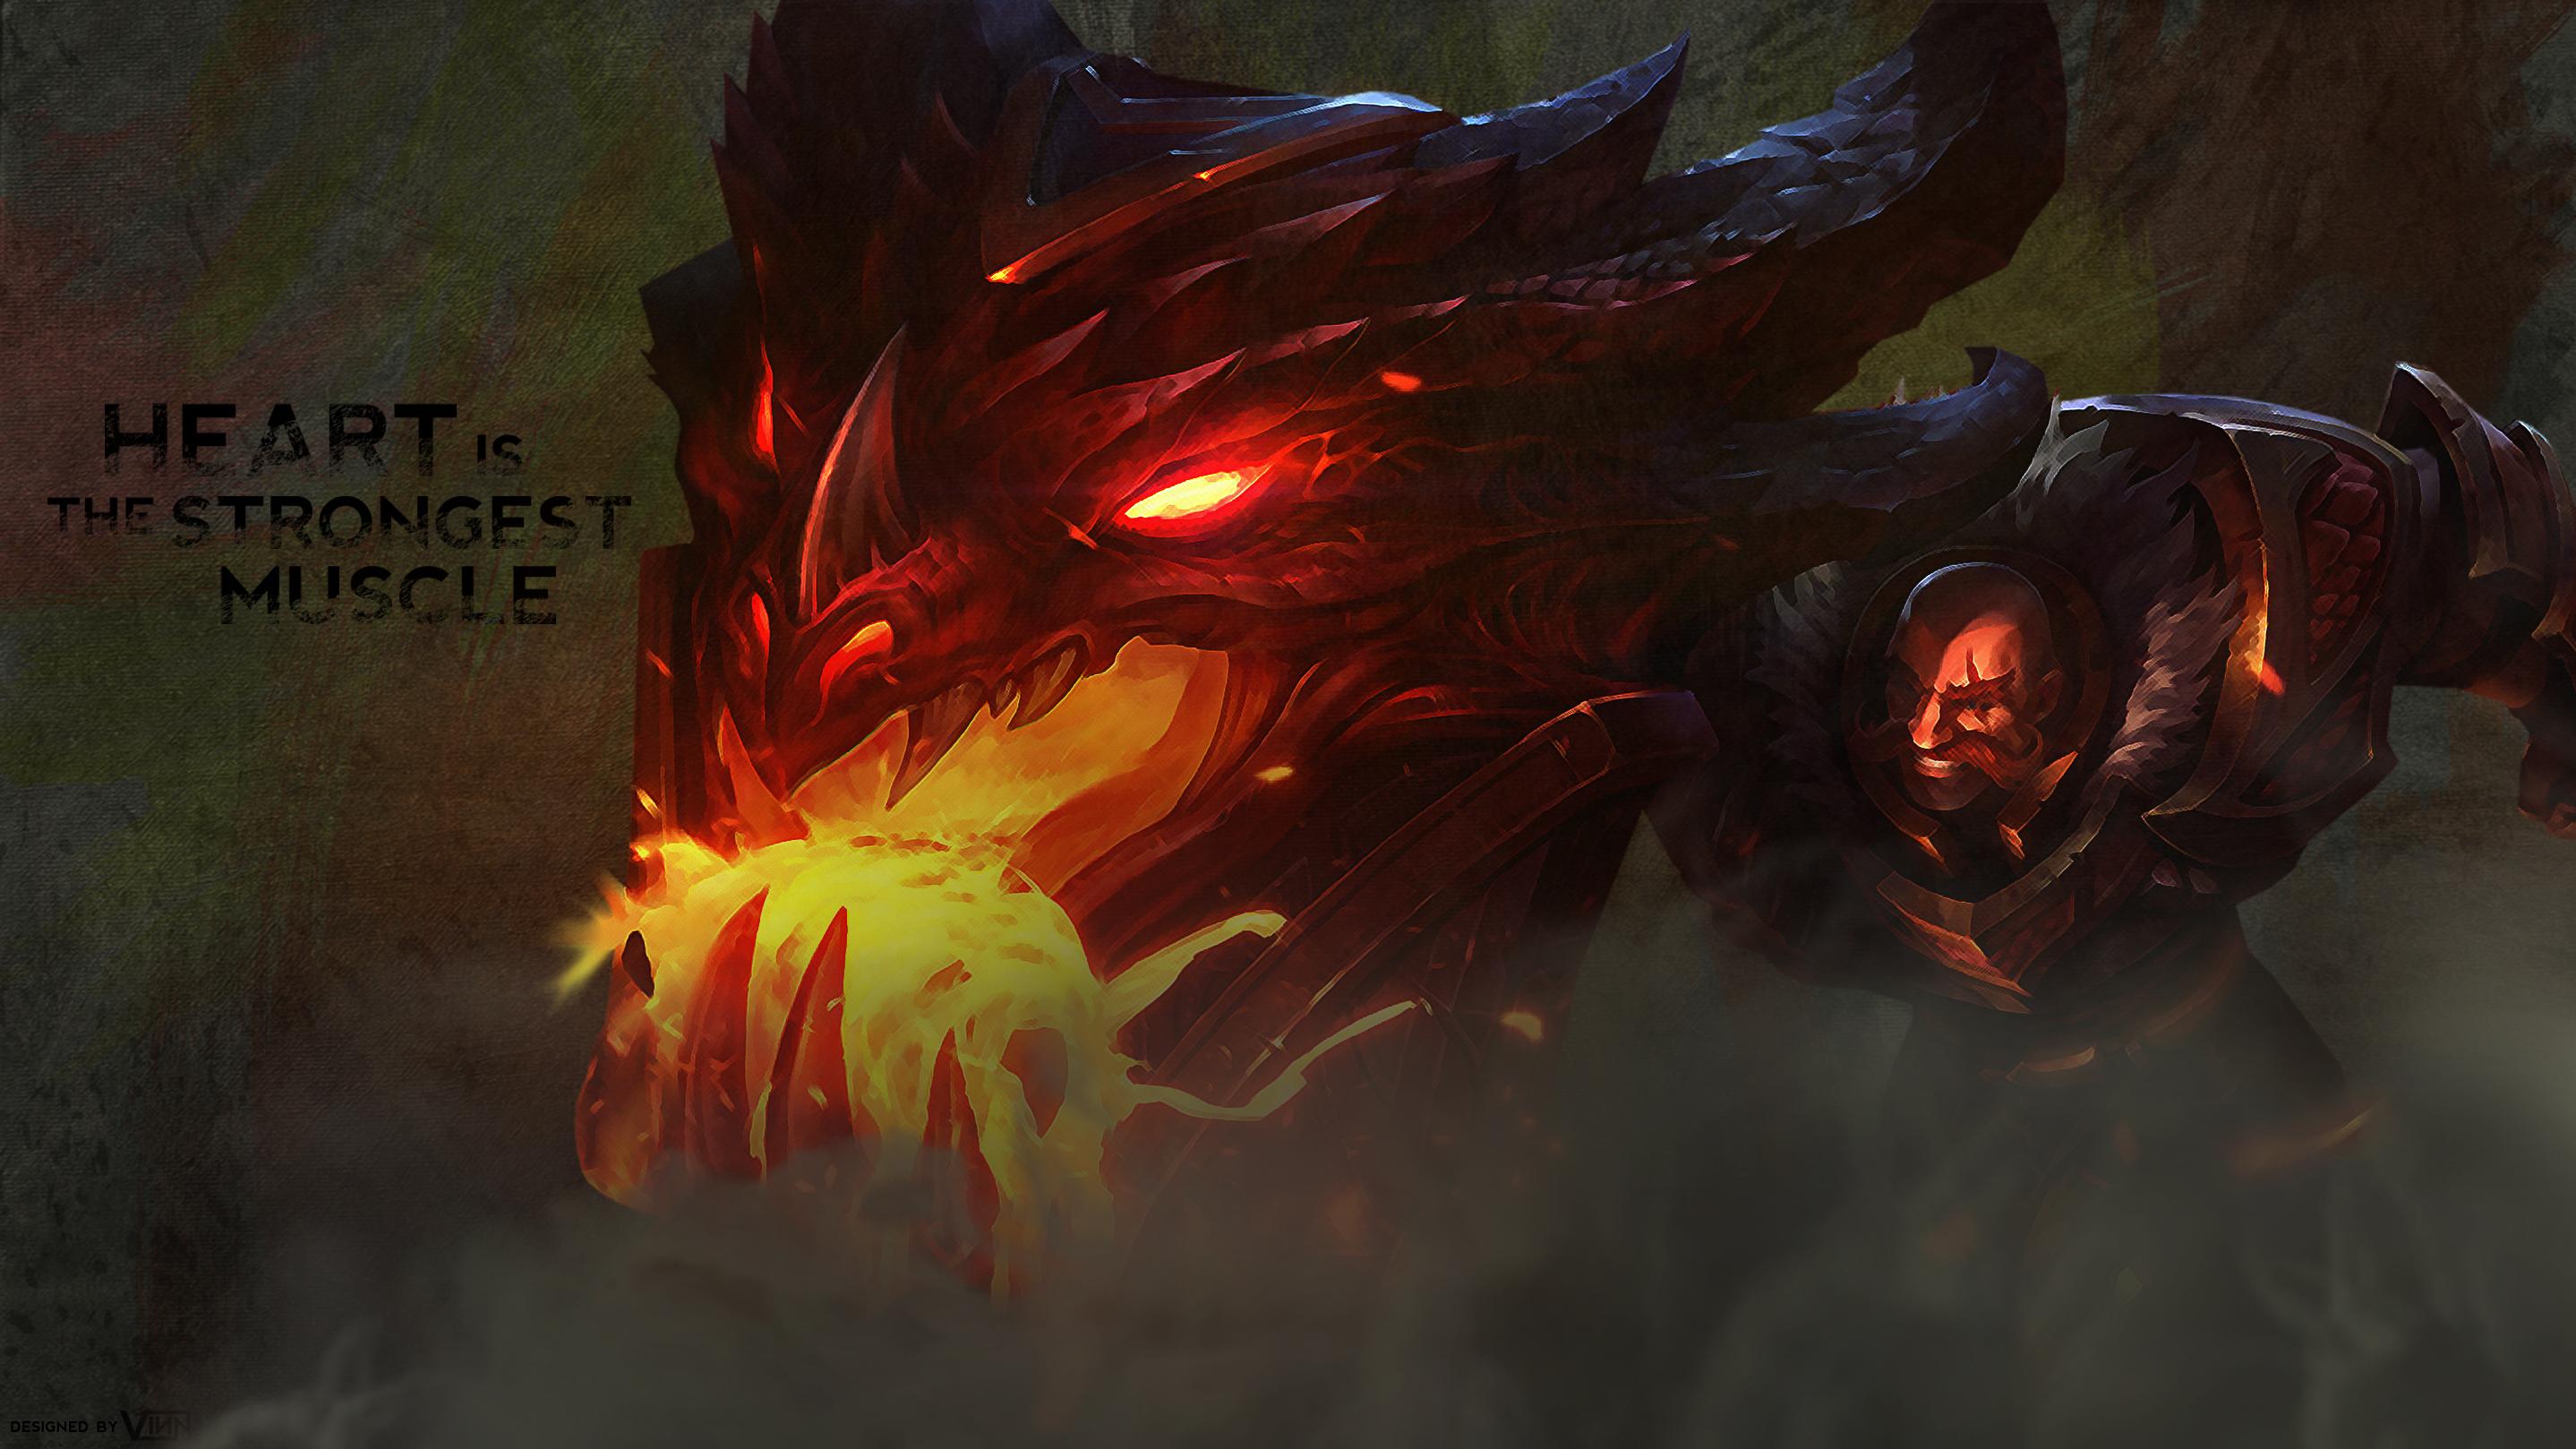 Dragonslayer Braum Wallpaper By Iamvinn On Deviantart